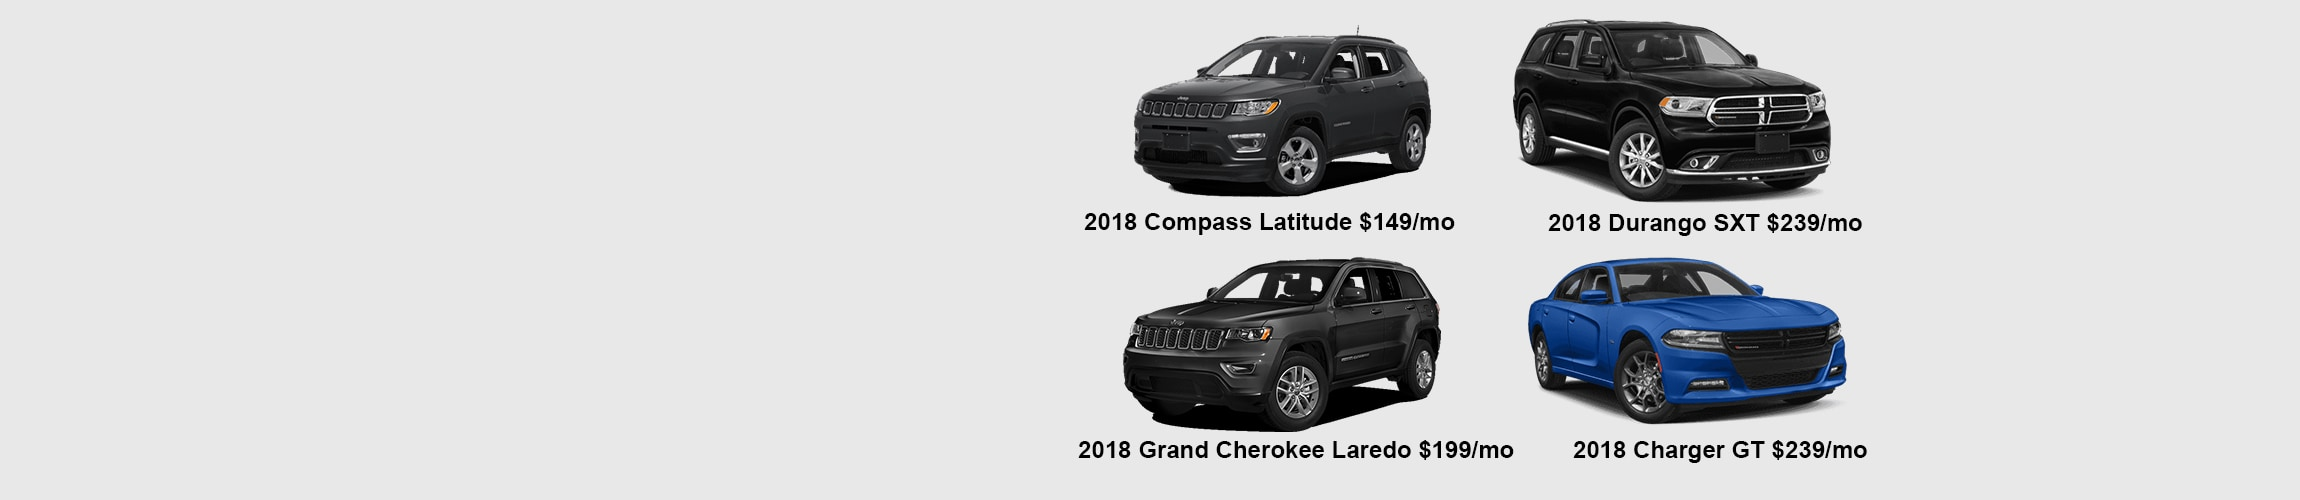 Gengras Chrysler Dodge Jeep Ram   New Dodge, Jeep, Chrysler, Ram ...